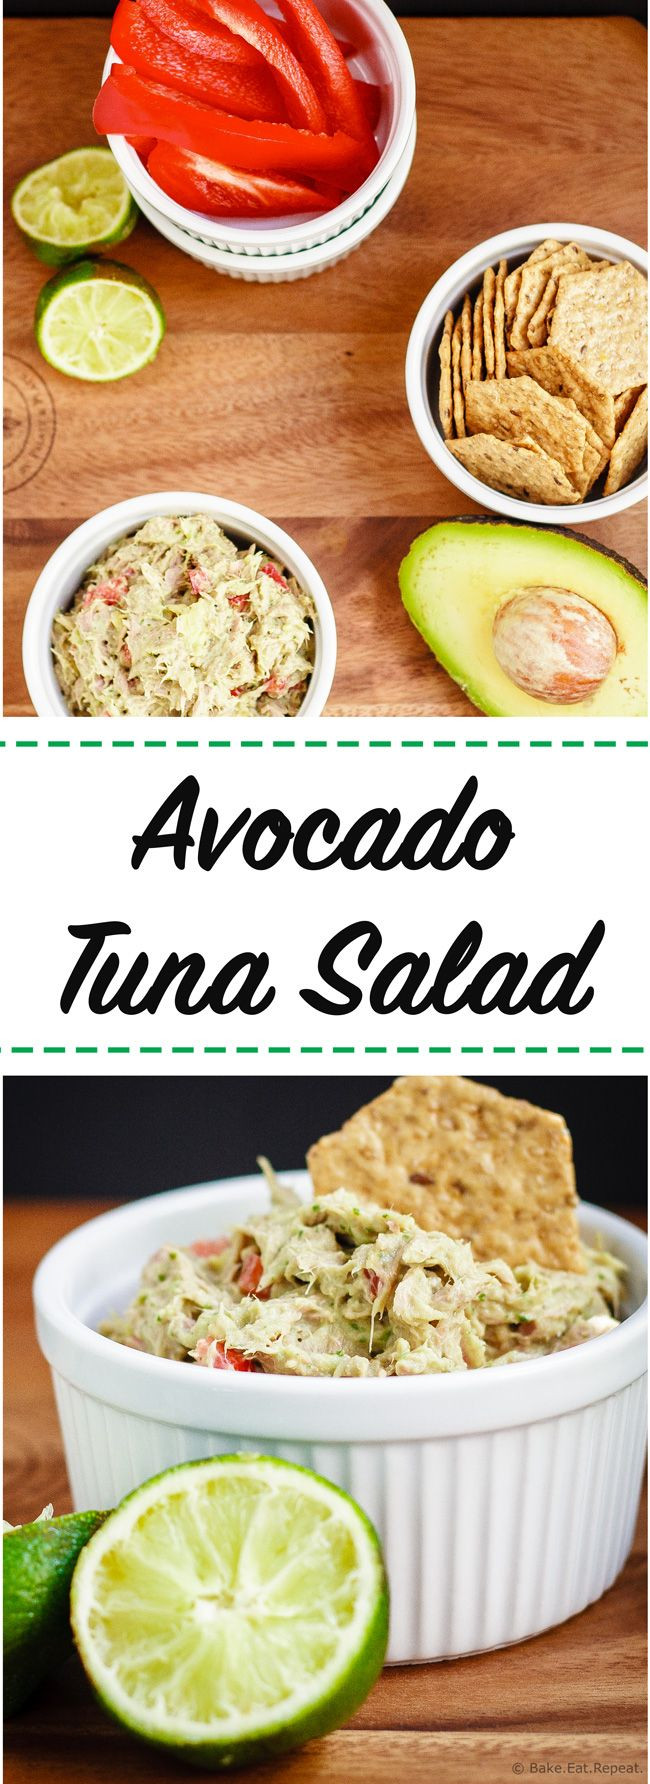 Healthy Tuna Snacks  25 best ideas about Avocado Tuna Salad on Pinterest